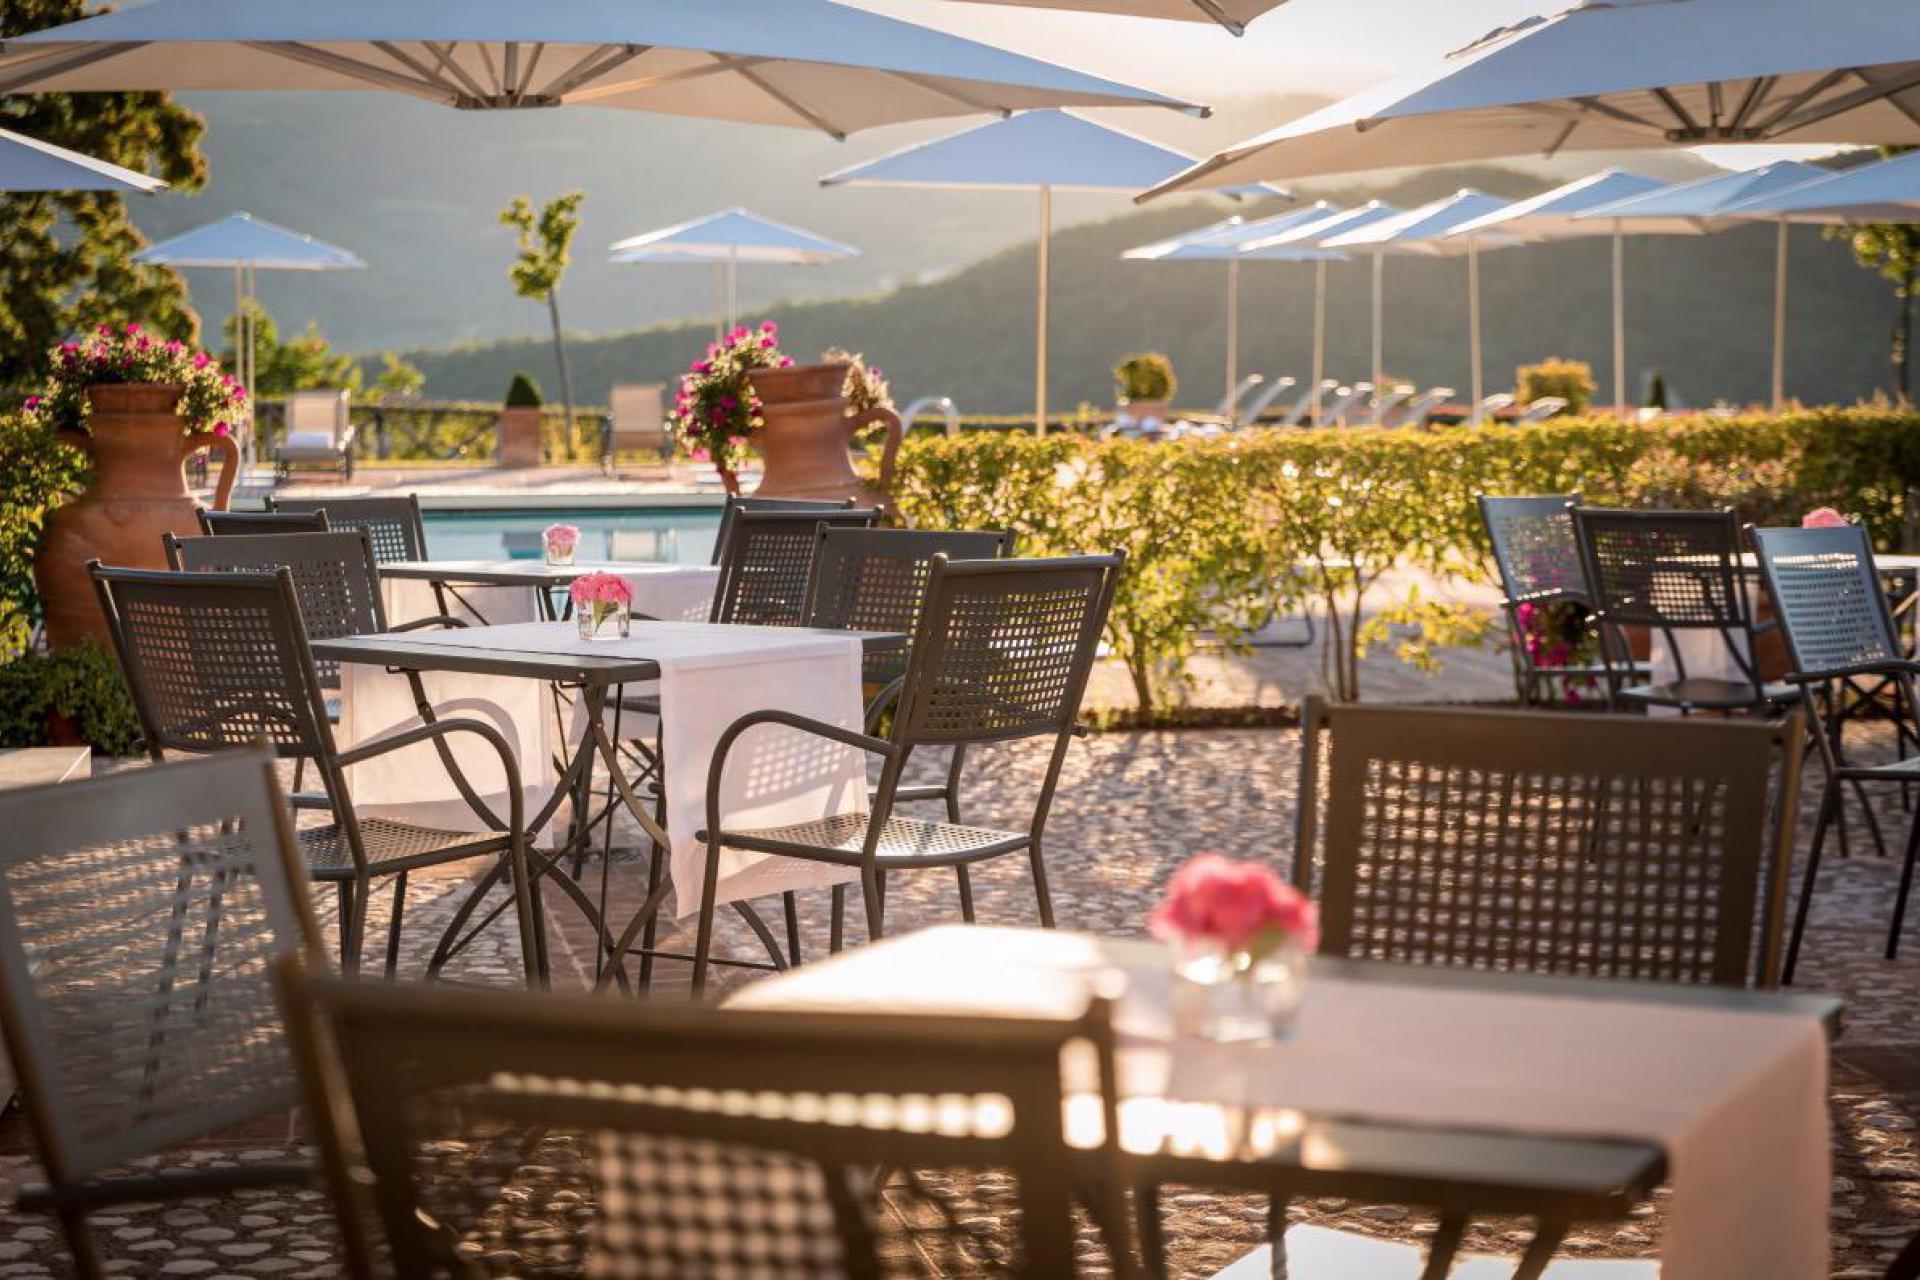 2. Familie resort met restaurant & pizzeria